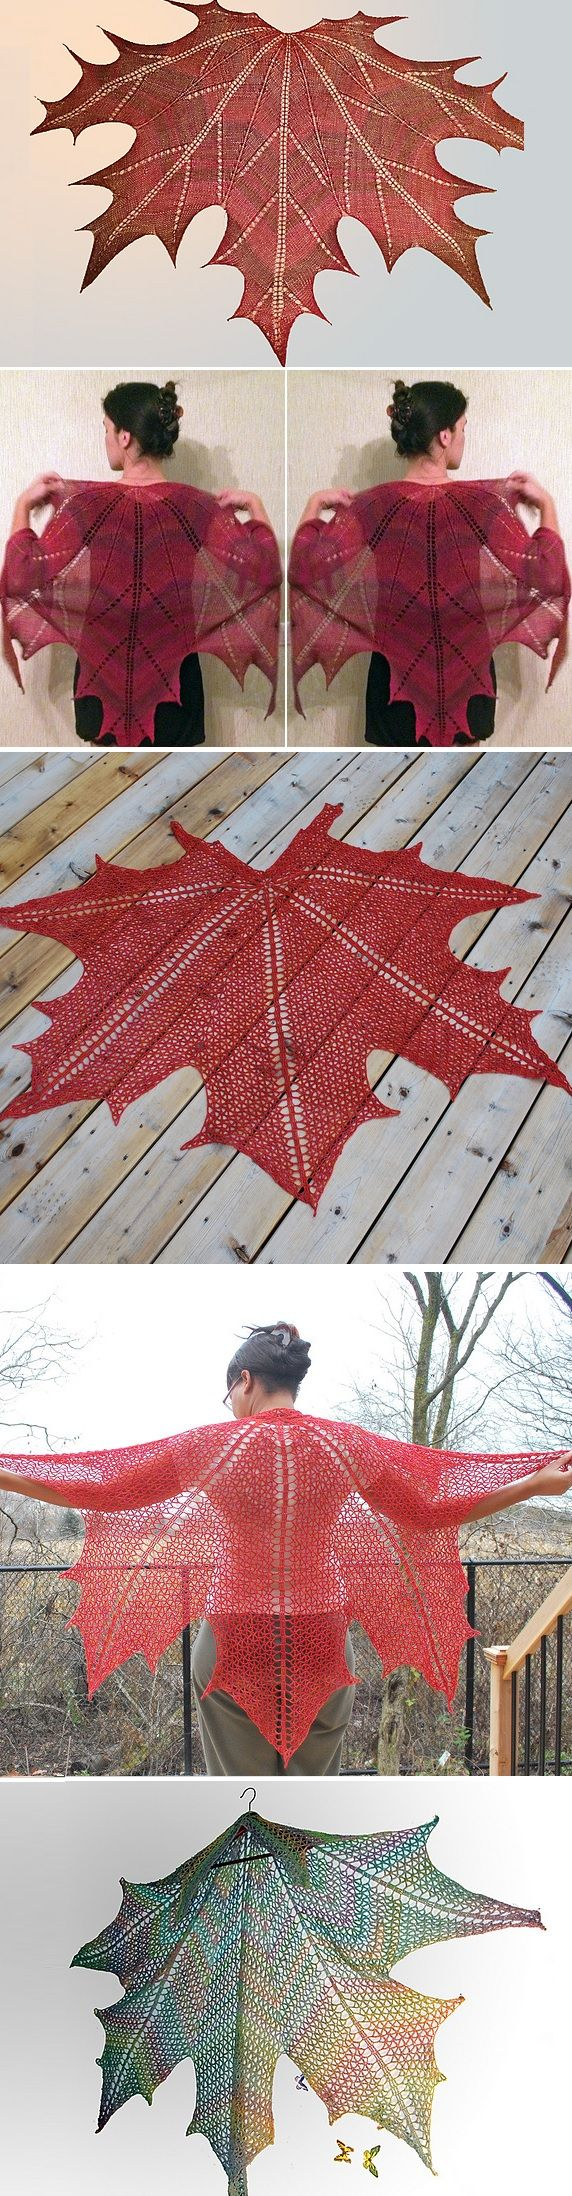 Make Maple Leaf Shawl | Pinterest